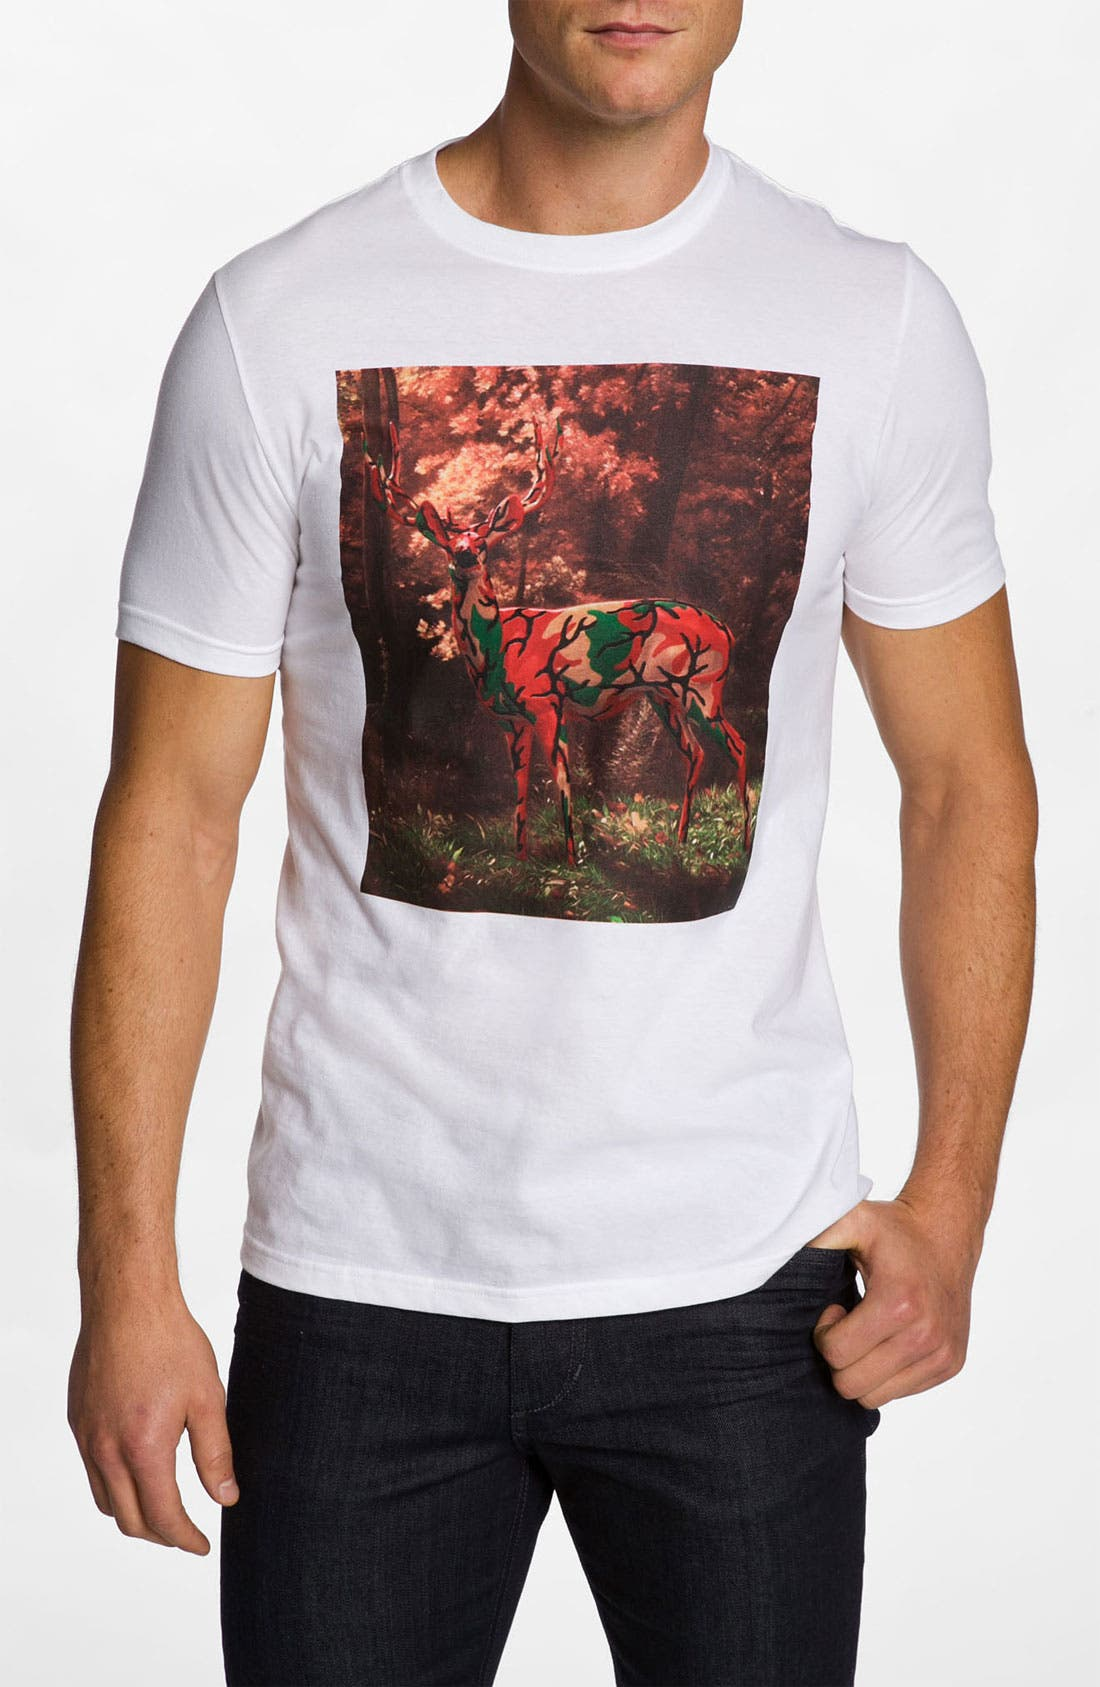 Alternate Image 1 Selected - Hurley 'Camo Deer' Graphic T-Shirt